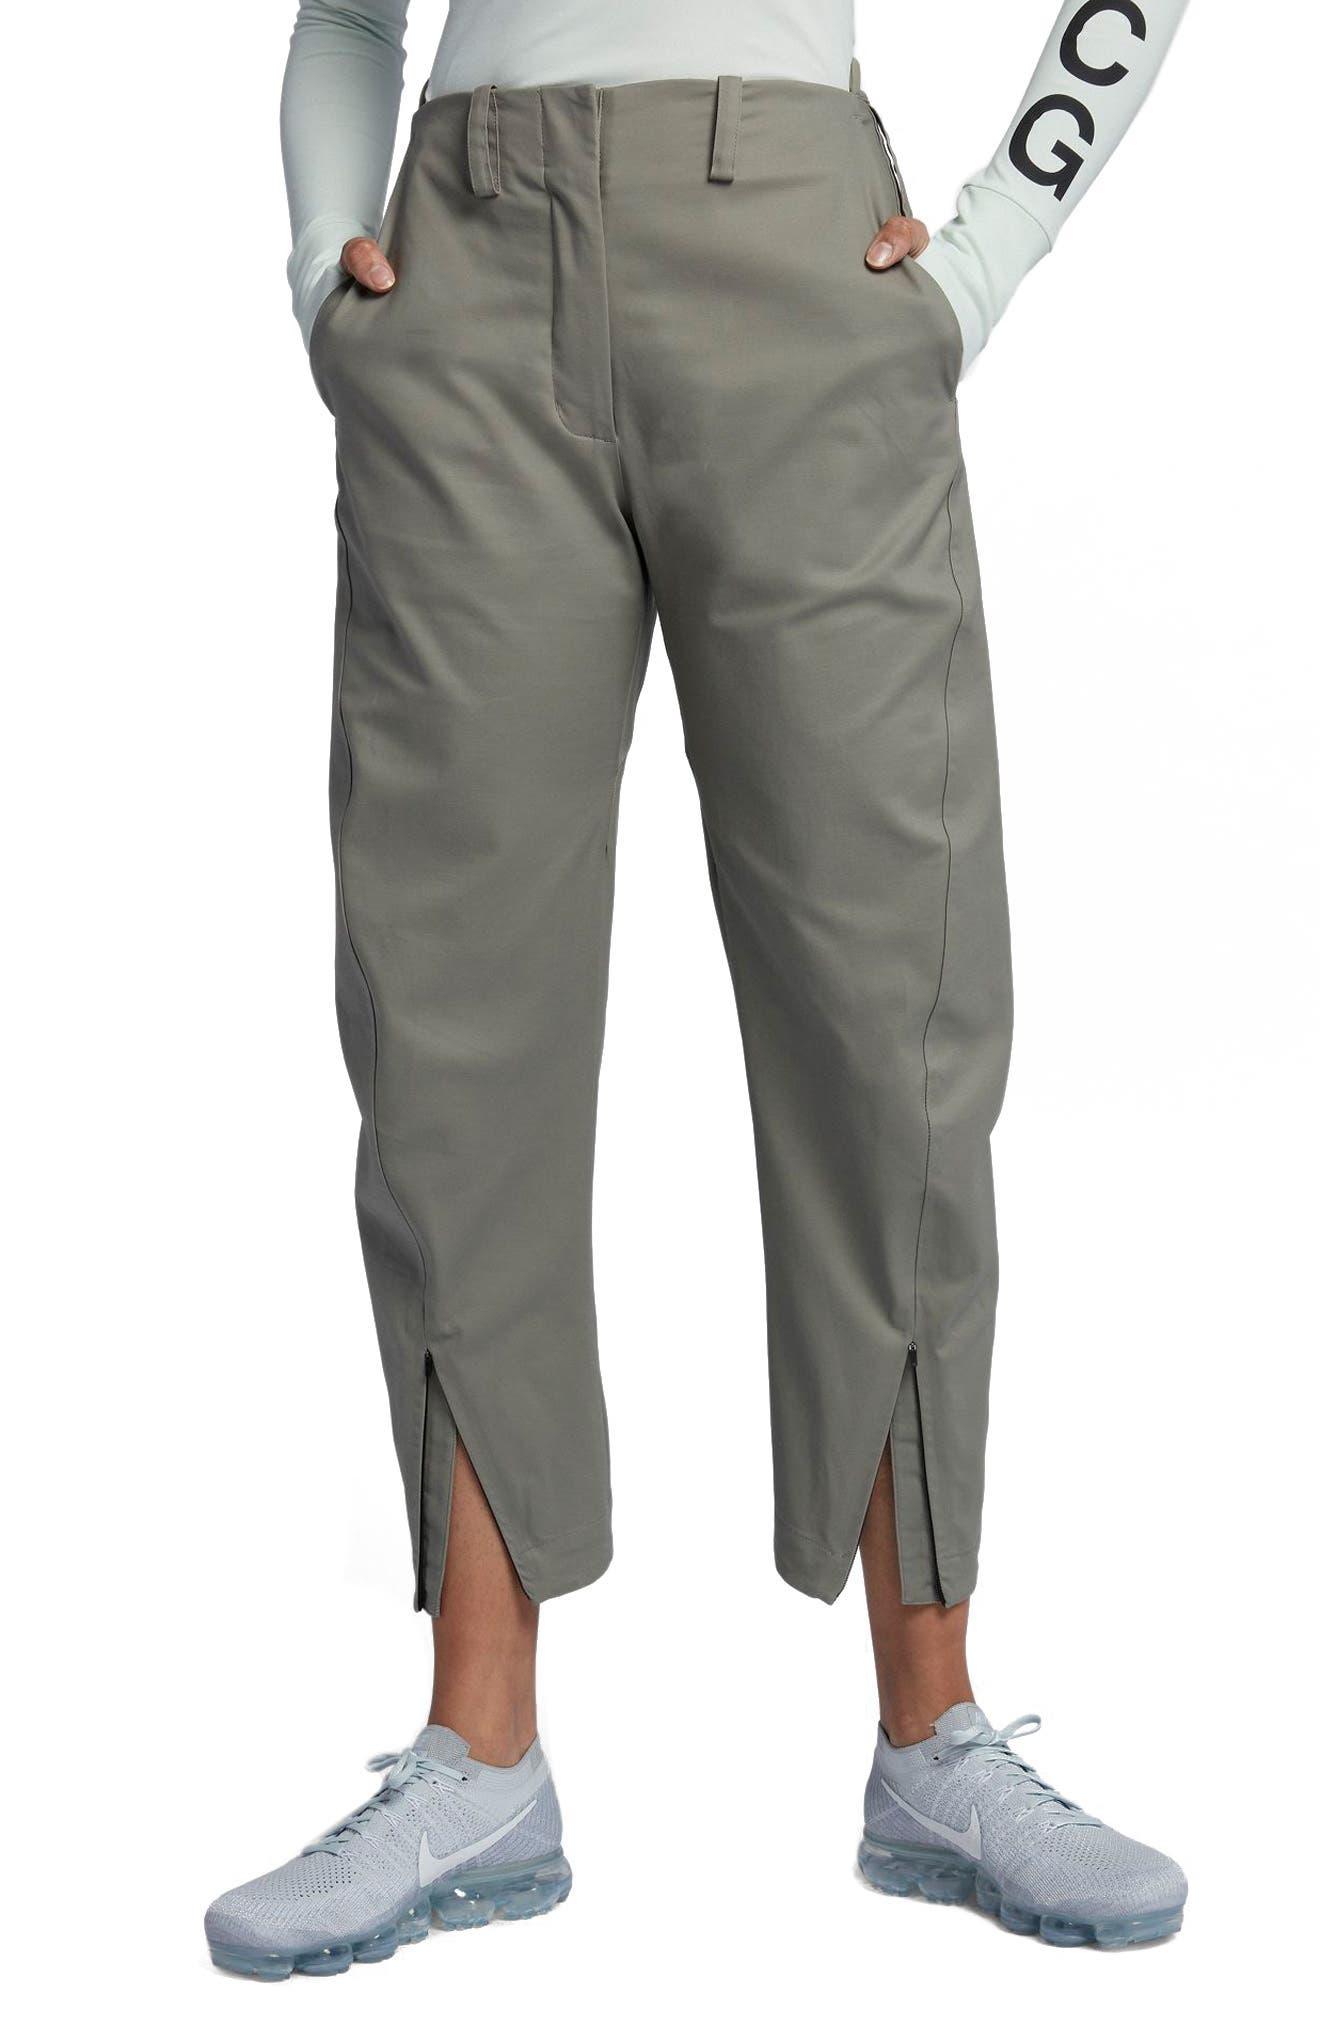 NikeLab ACG Tech Woven Pants,                         Main,                         color, 020